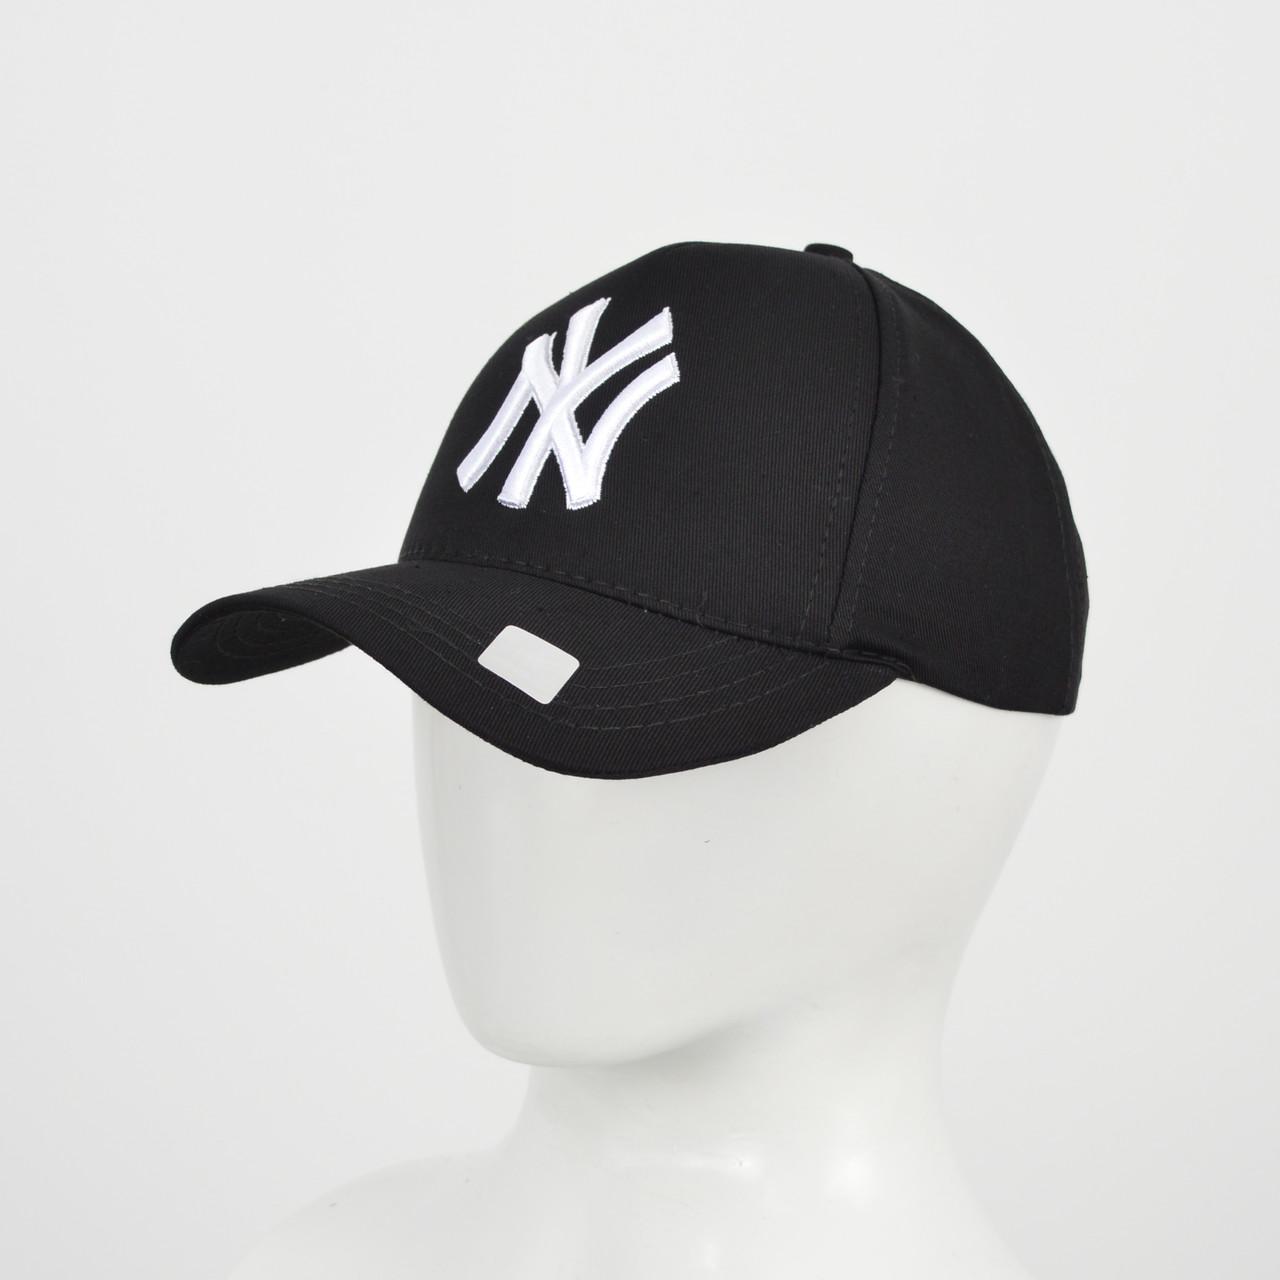 "Бейсболка ""Котон 5кл"" NY (реплика) черный+белый"